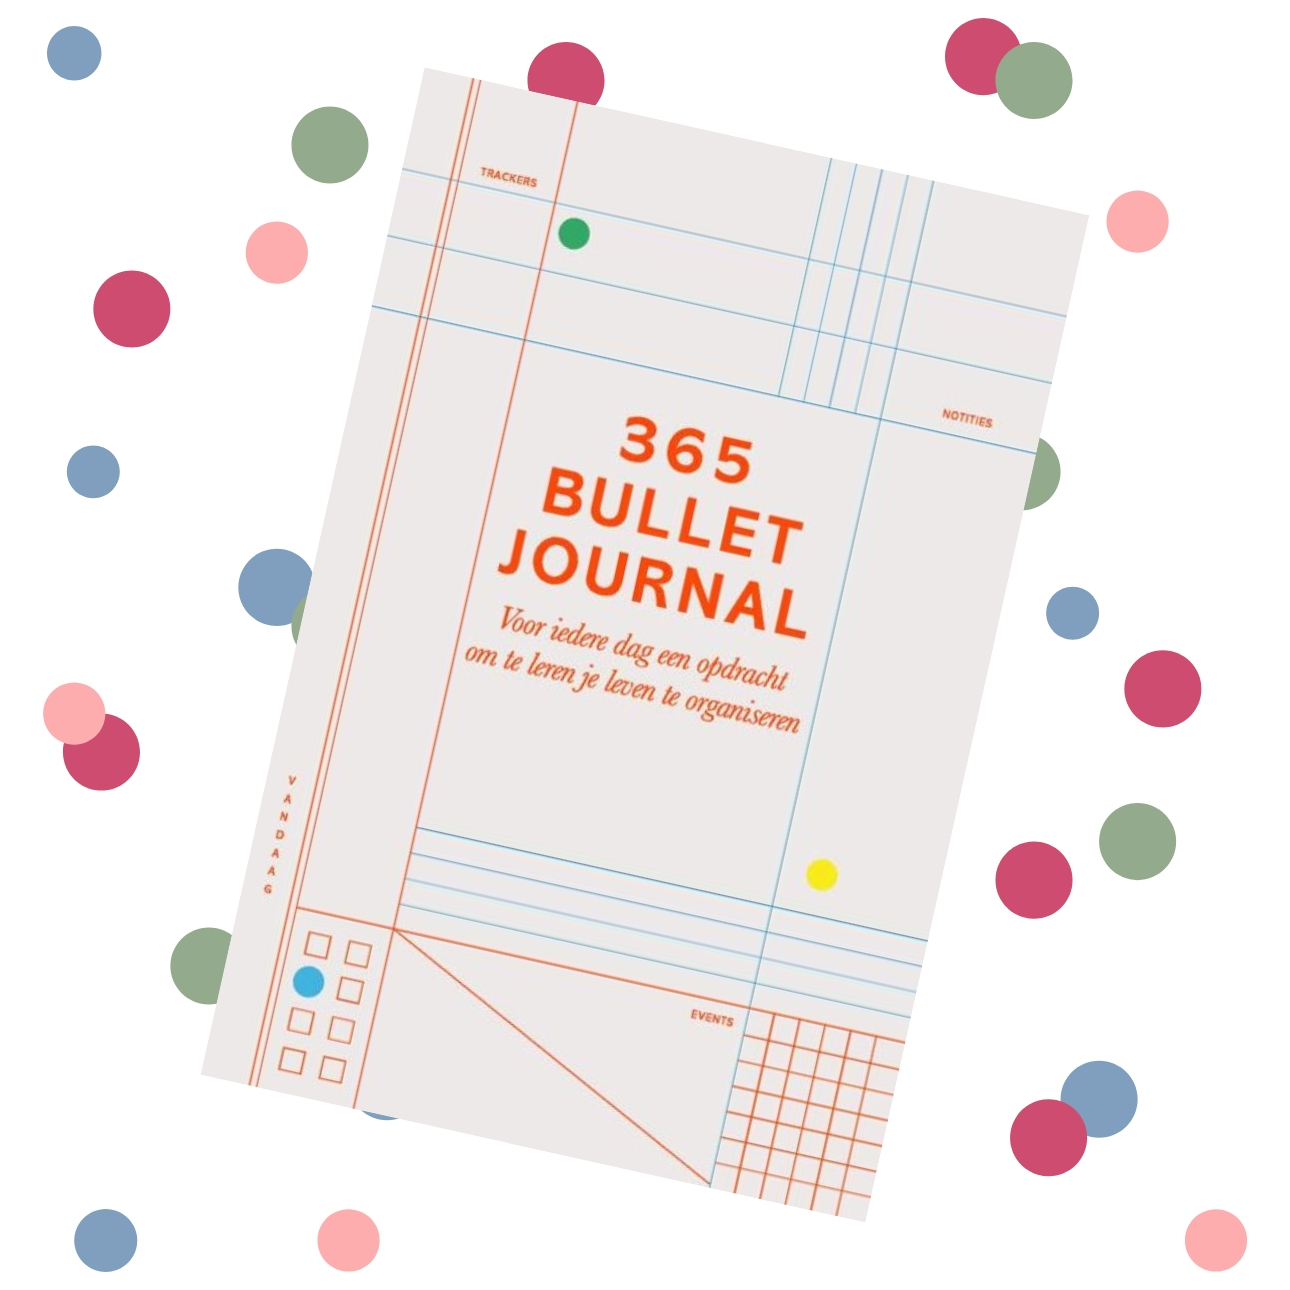 dagboeken wishlist - 365 bullet journal